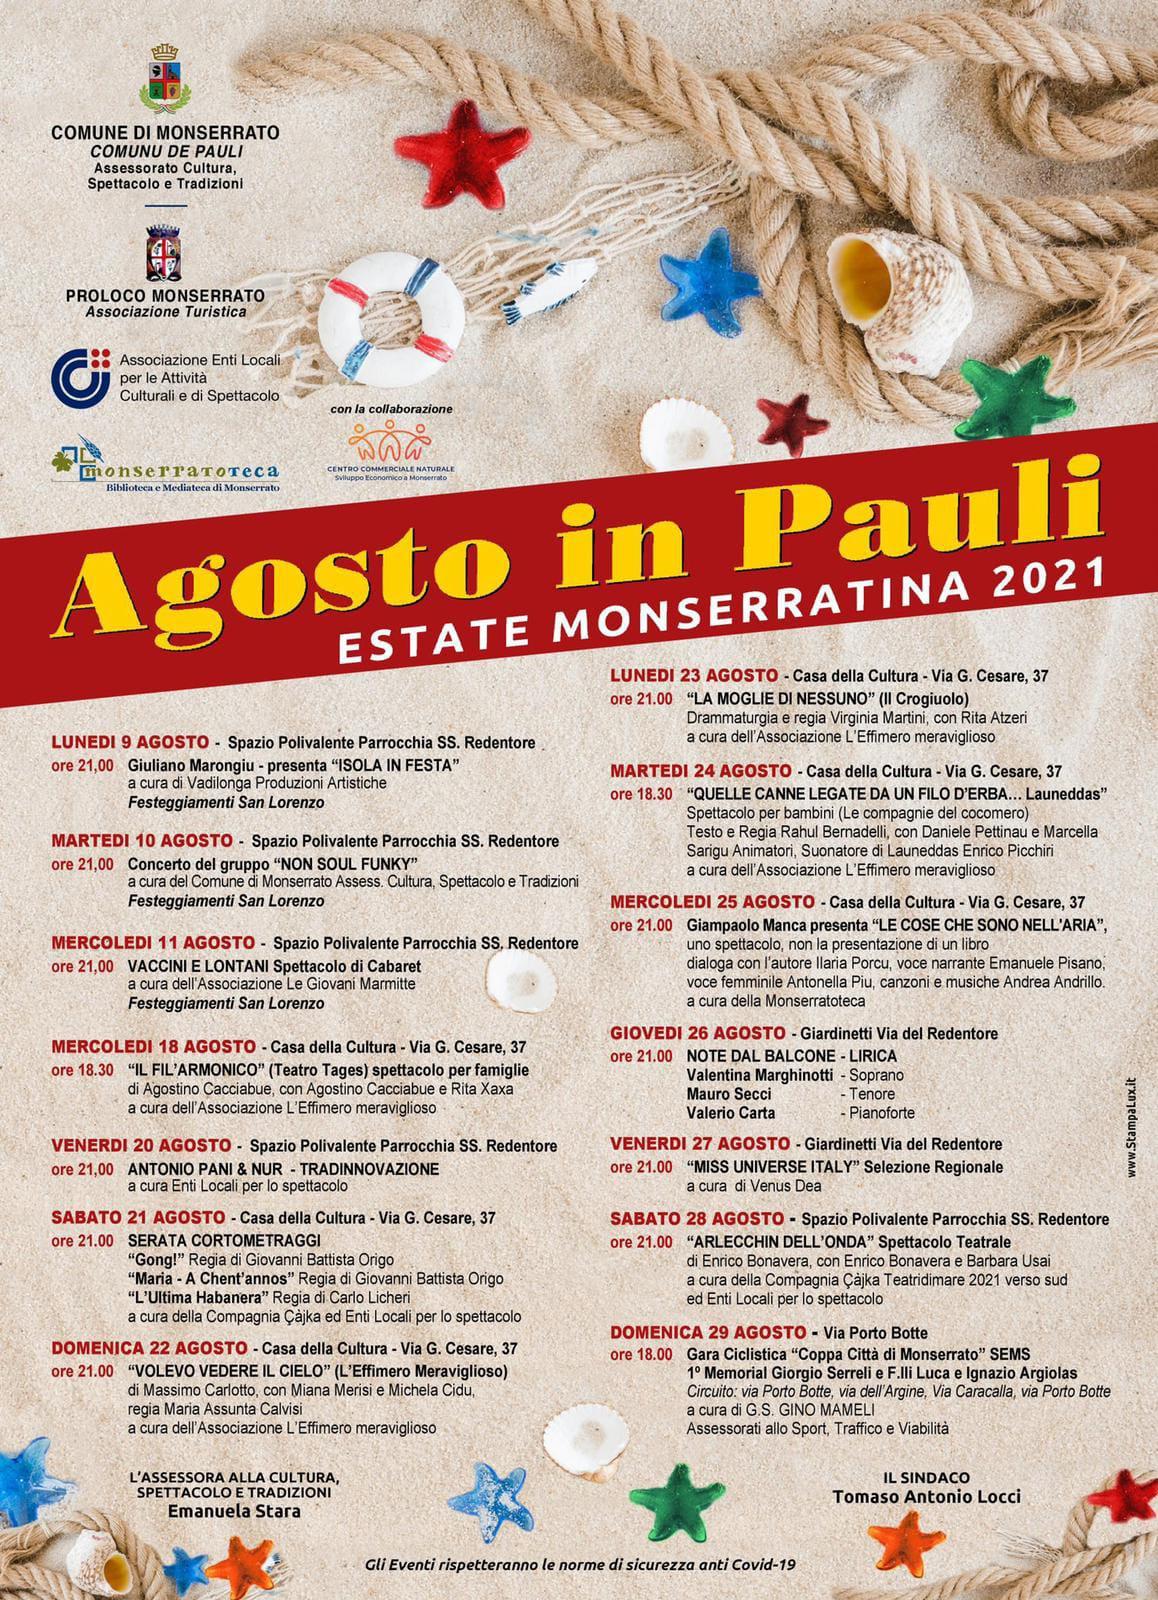 Agosto in Pauli – Estate Monserratina 2021